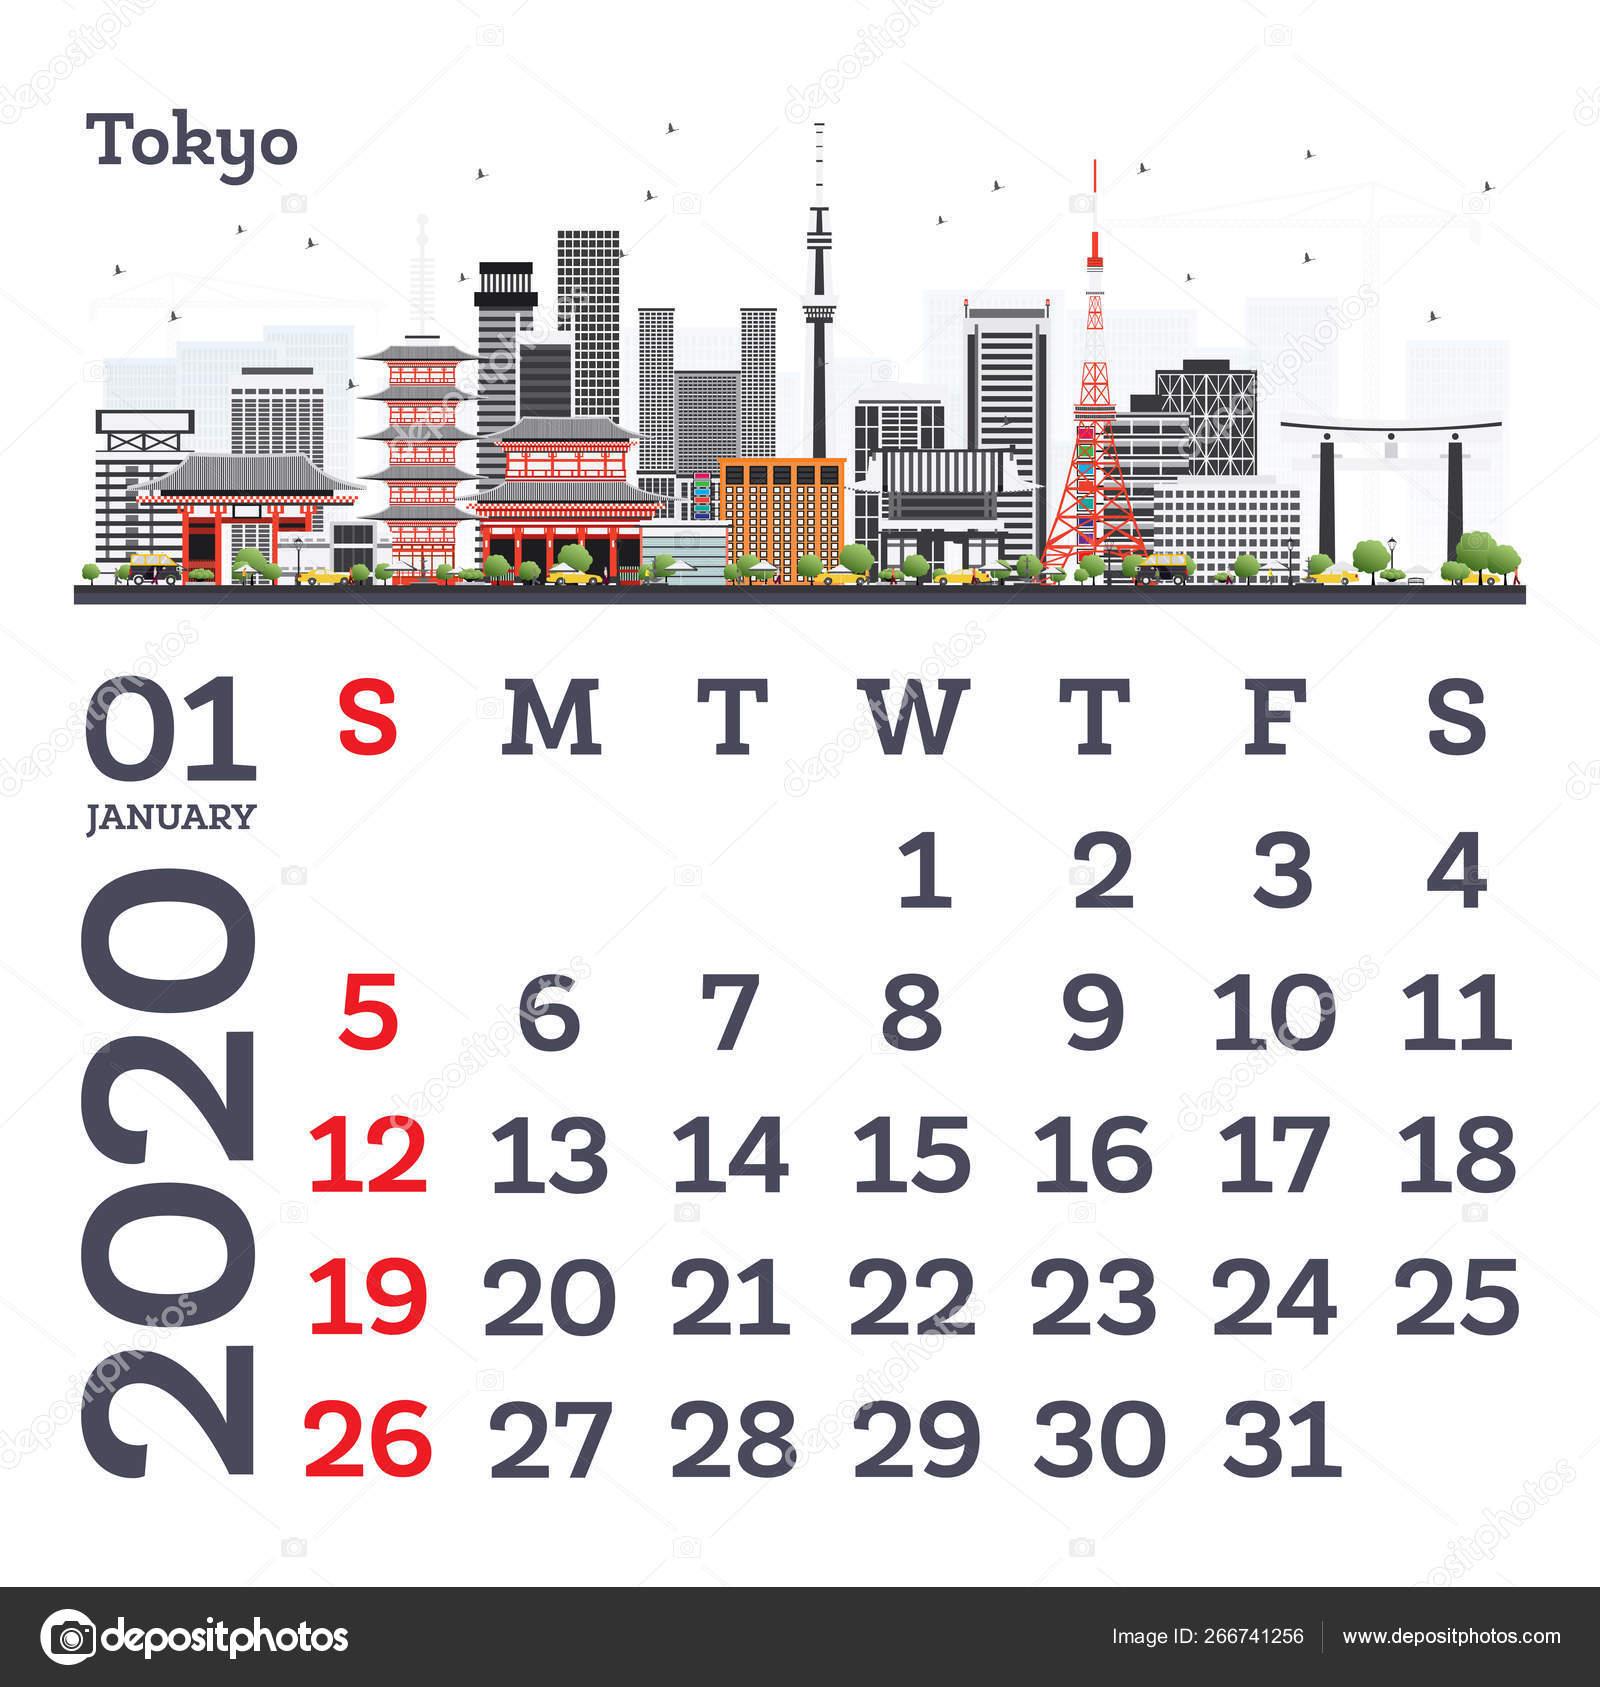 January 2020 Calendar Template With Tokyo City Skyline